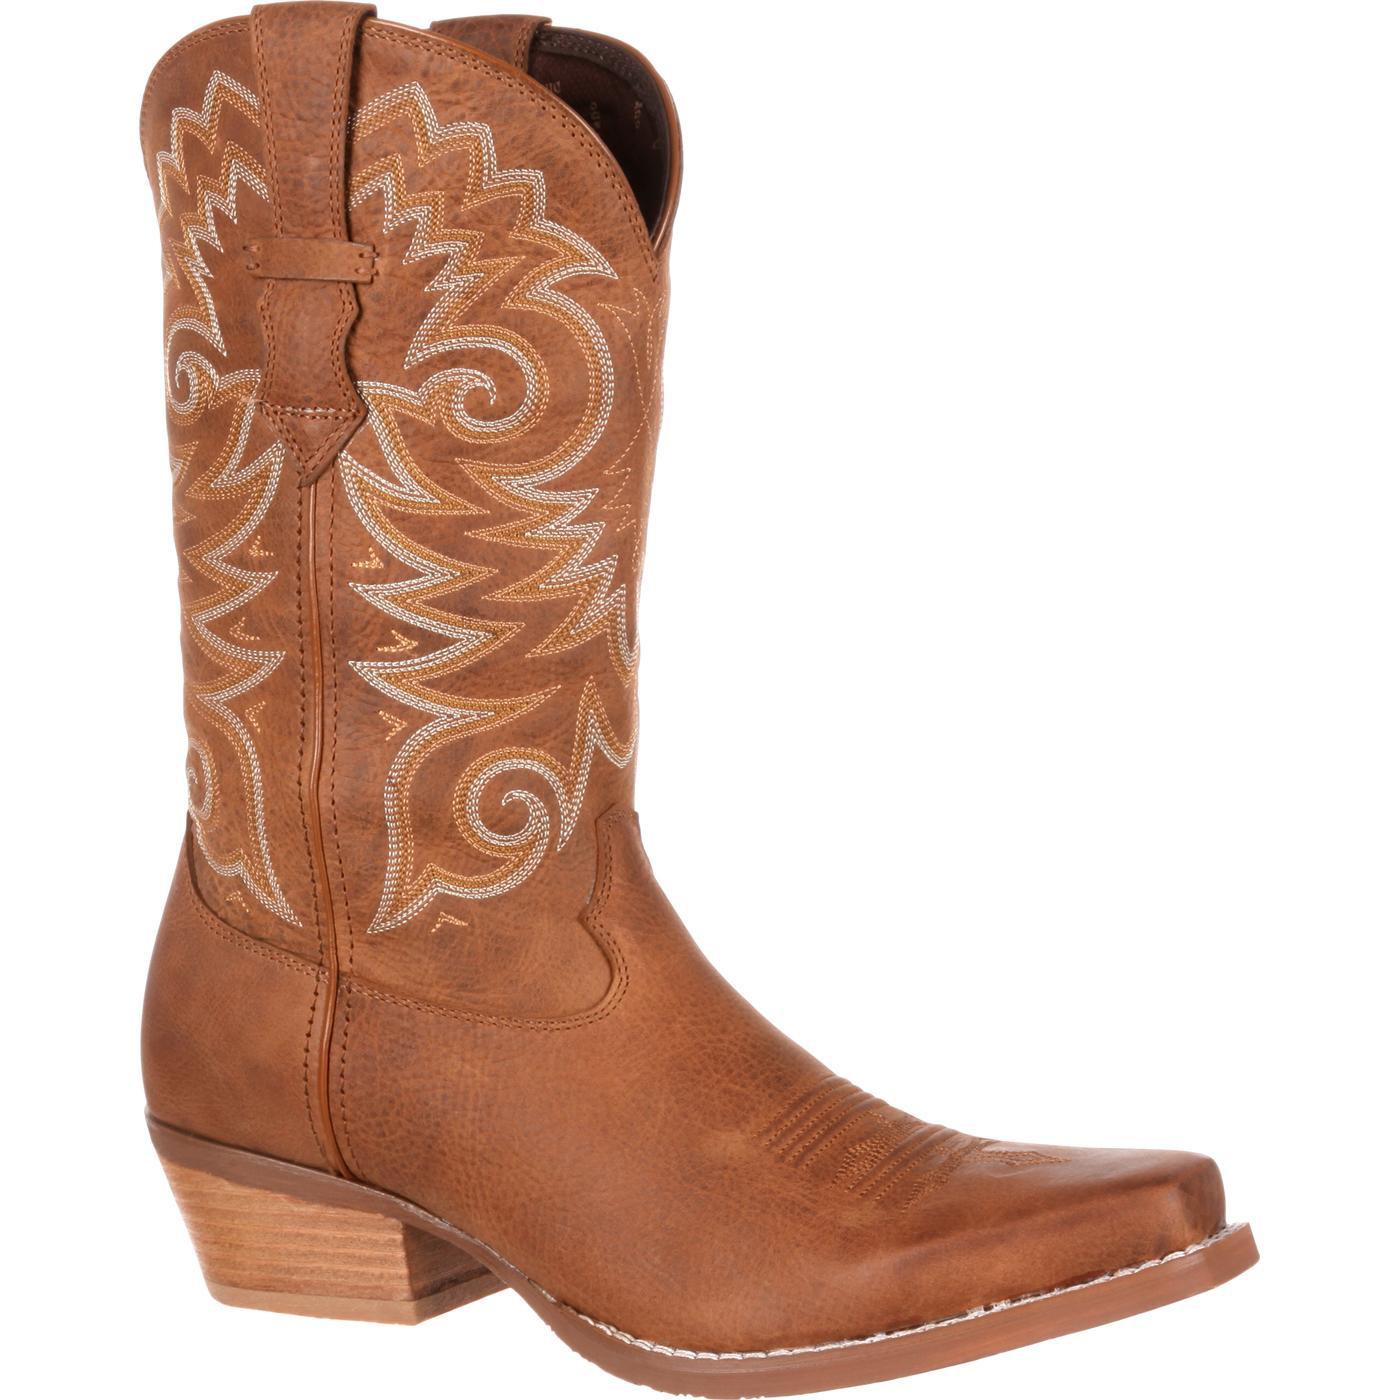 Men\'s 12-in Western Boot, Gambler by Durango style DDB0072